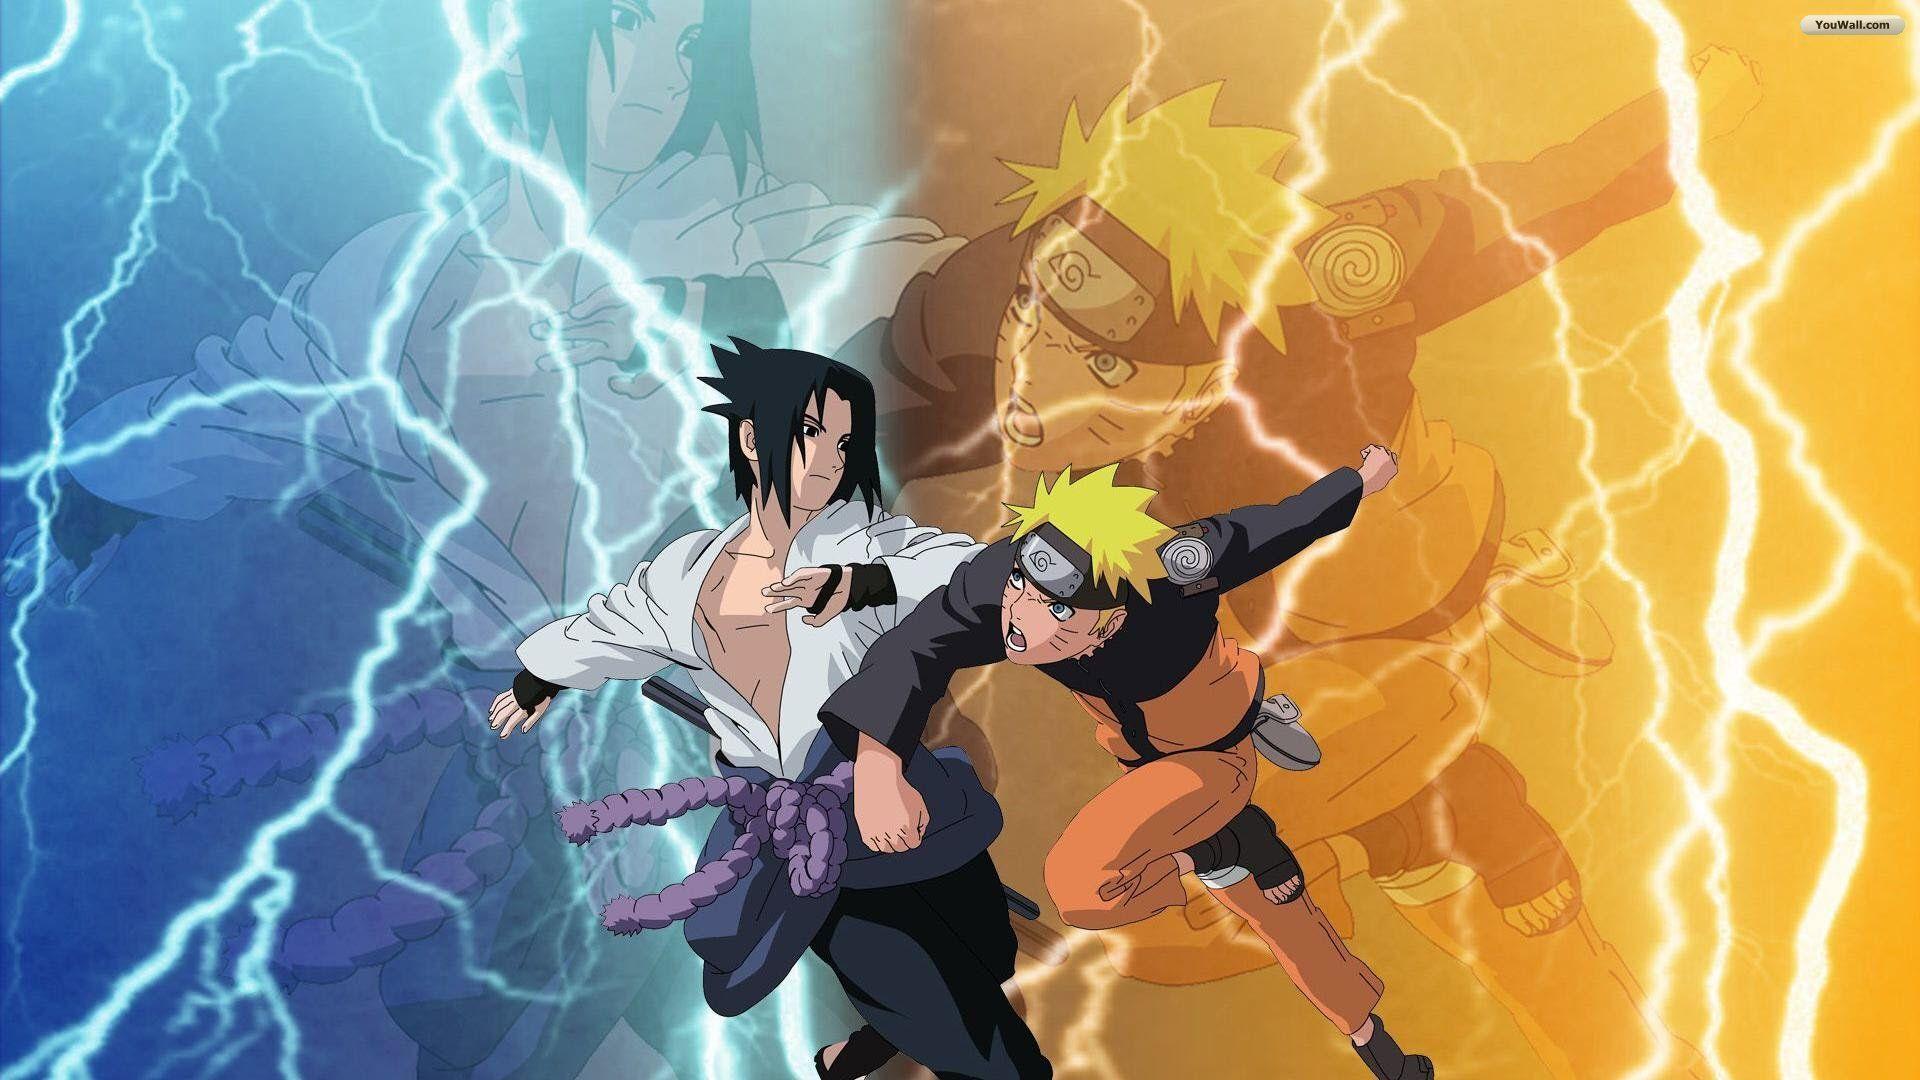 Naruto And Sasuke Wallpapers Top Free Naruto And Sasuke